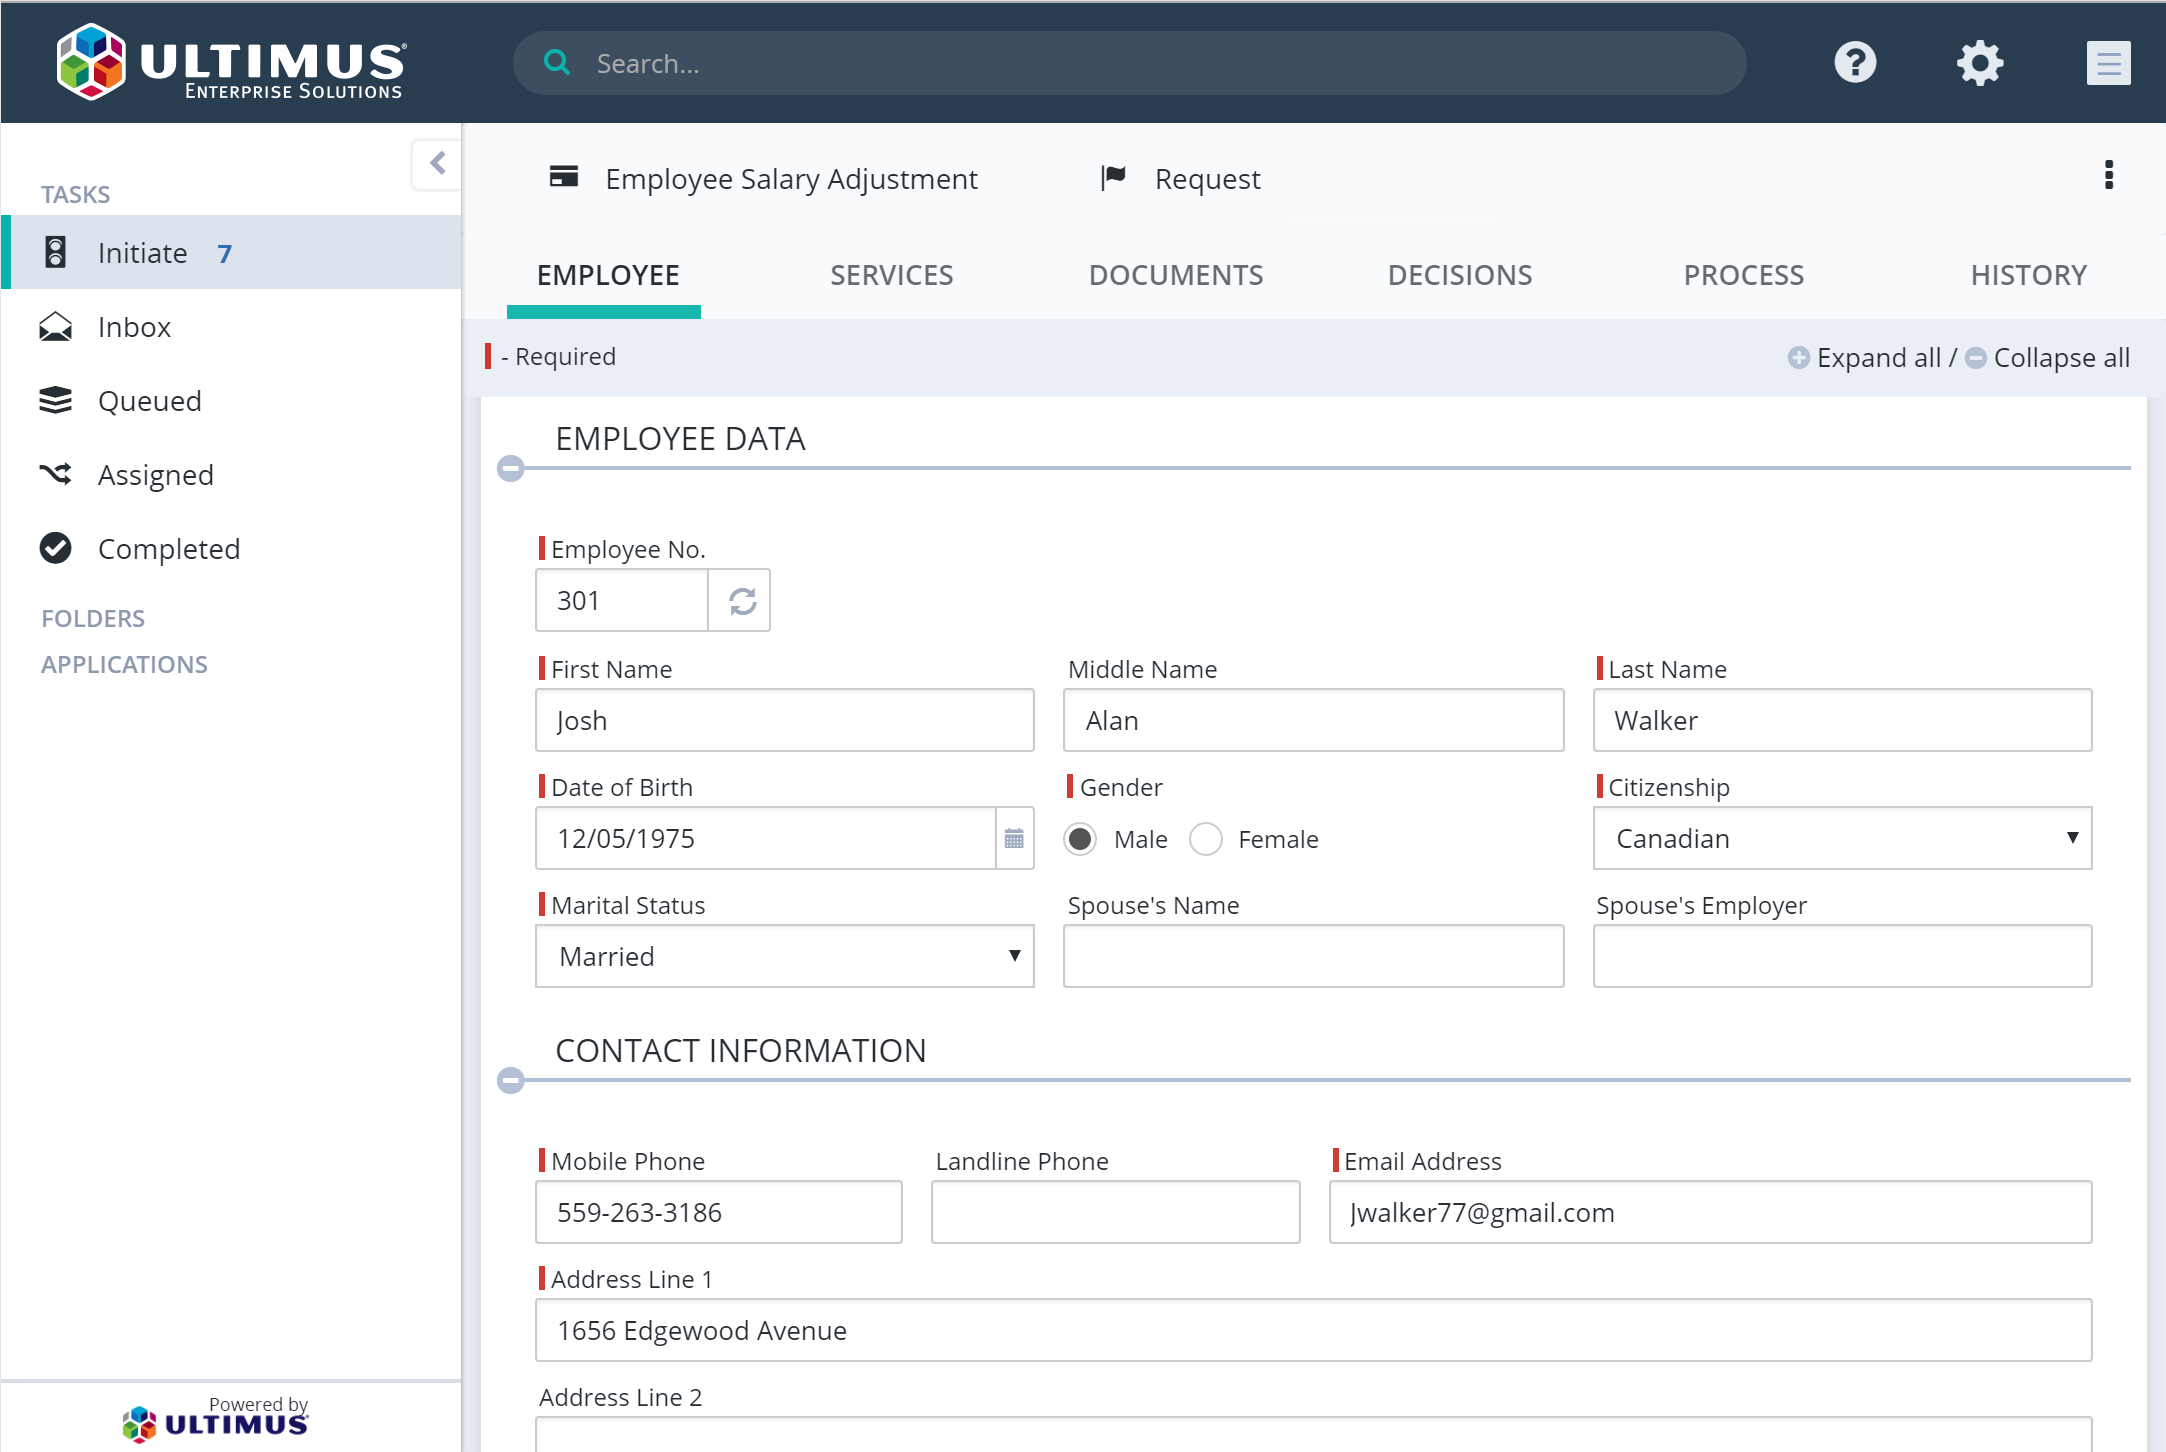 screenshot-employee_salary_adjustment-requester.png